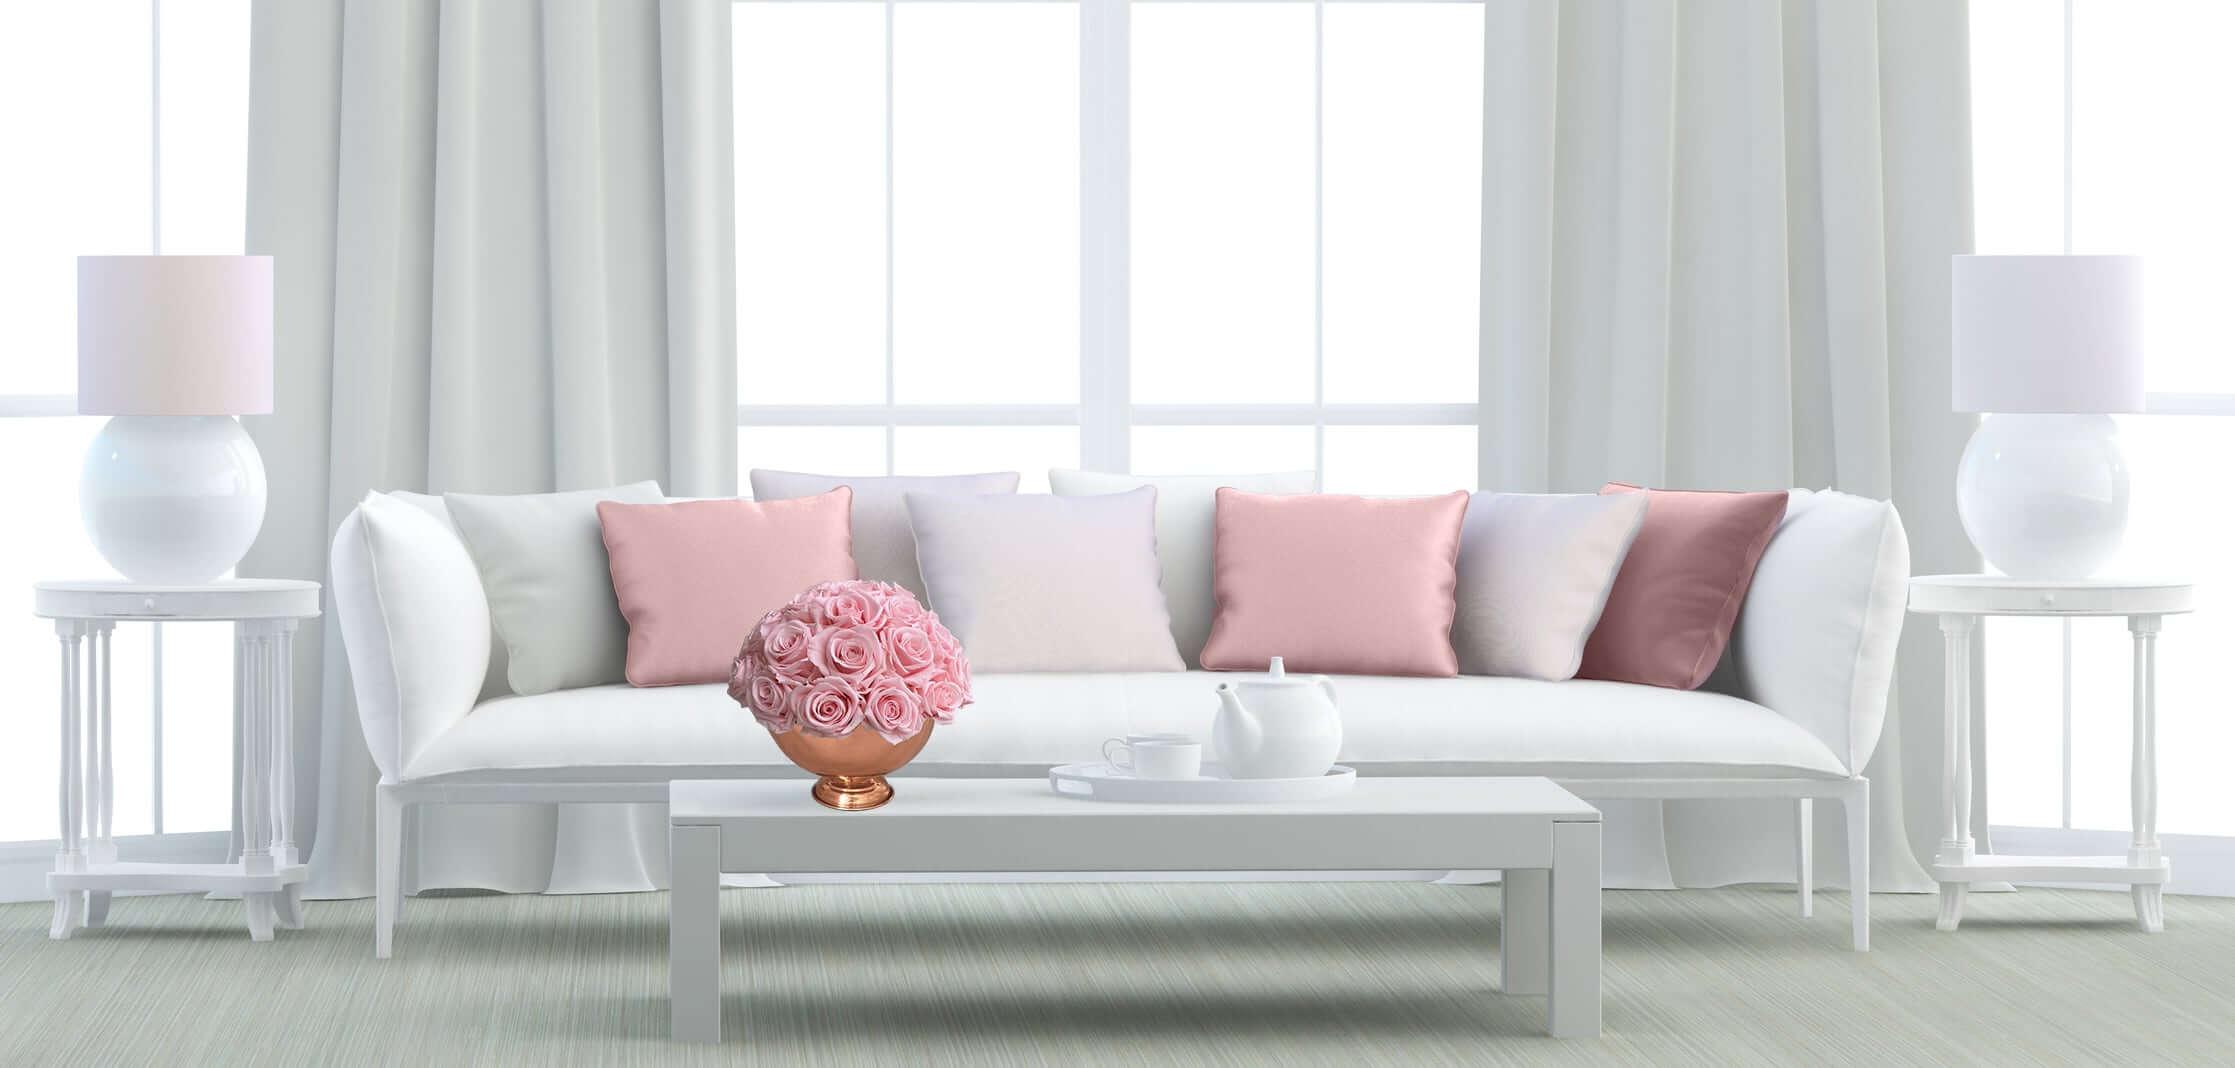 Heinau Pink Flowers Arrangement on Table Interior